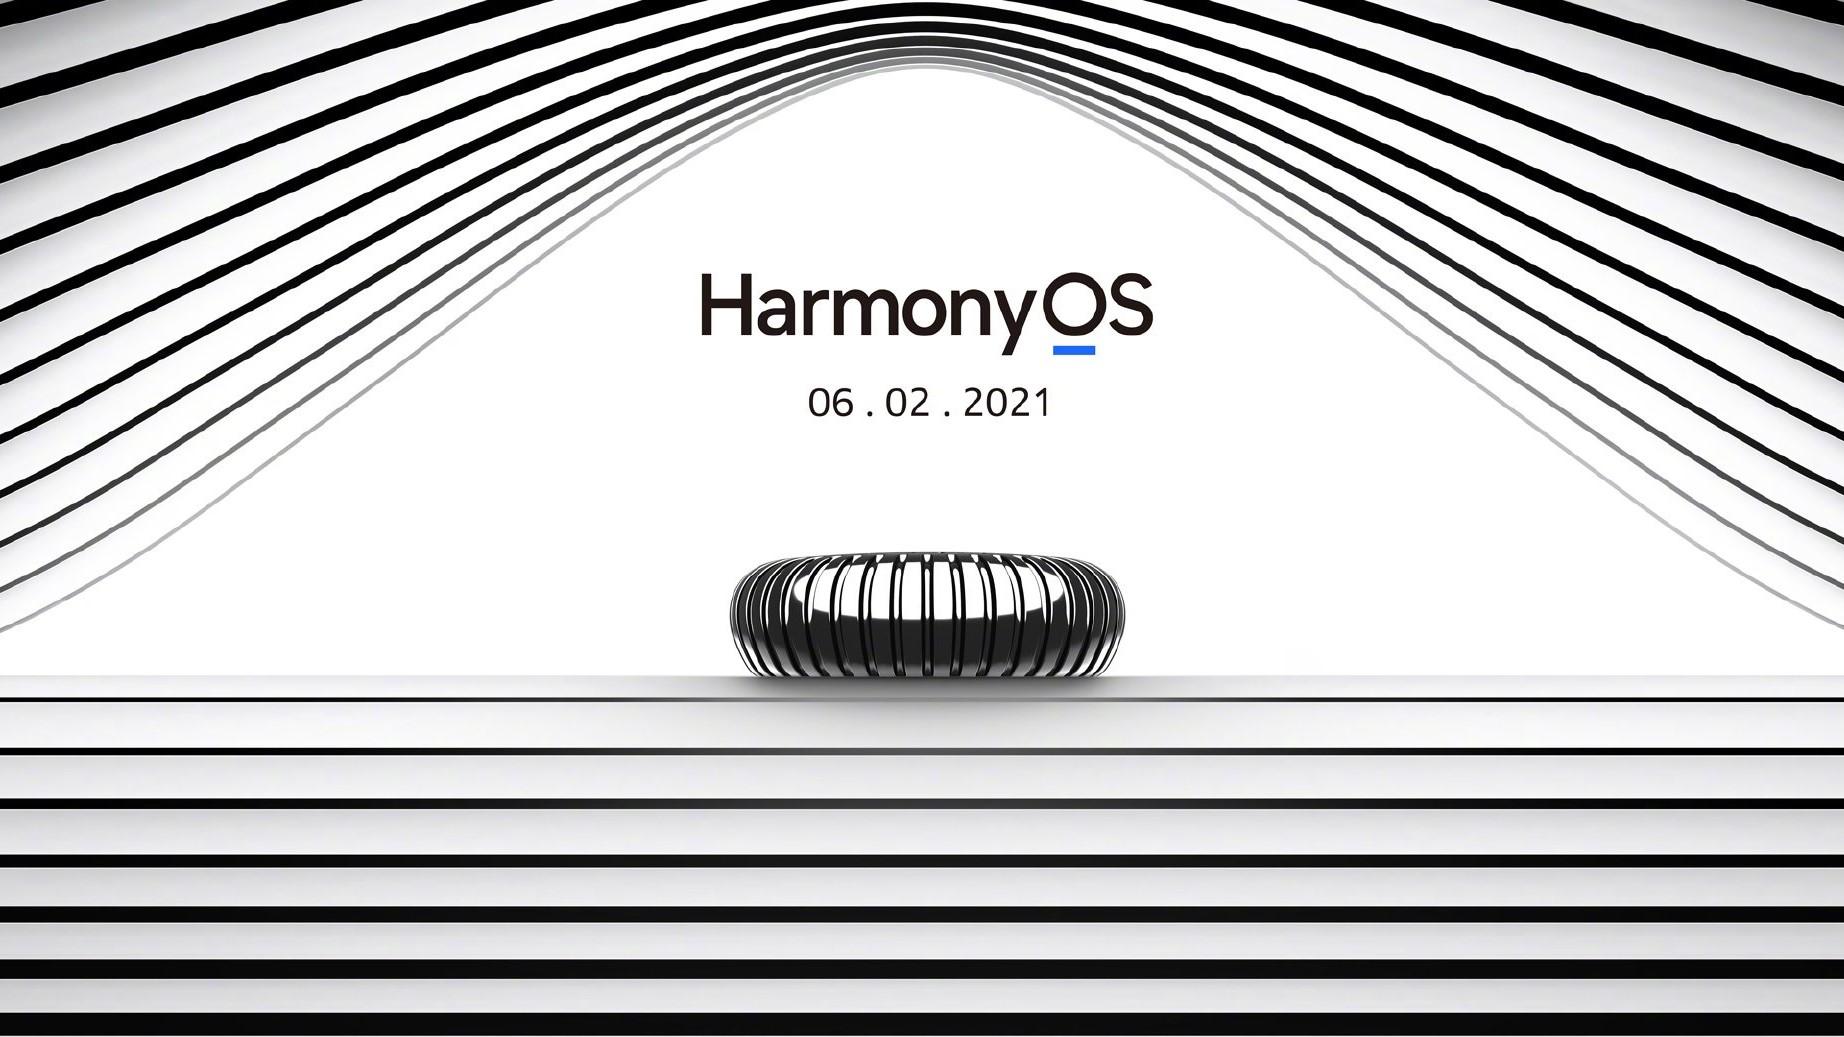 Huawei Watch 3 HarmonyOS Teaser